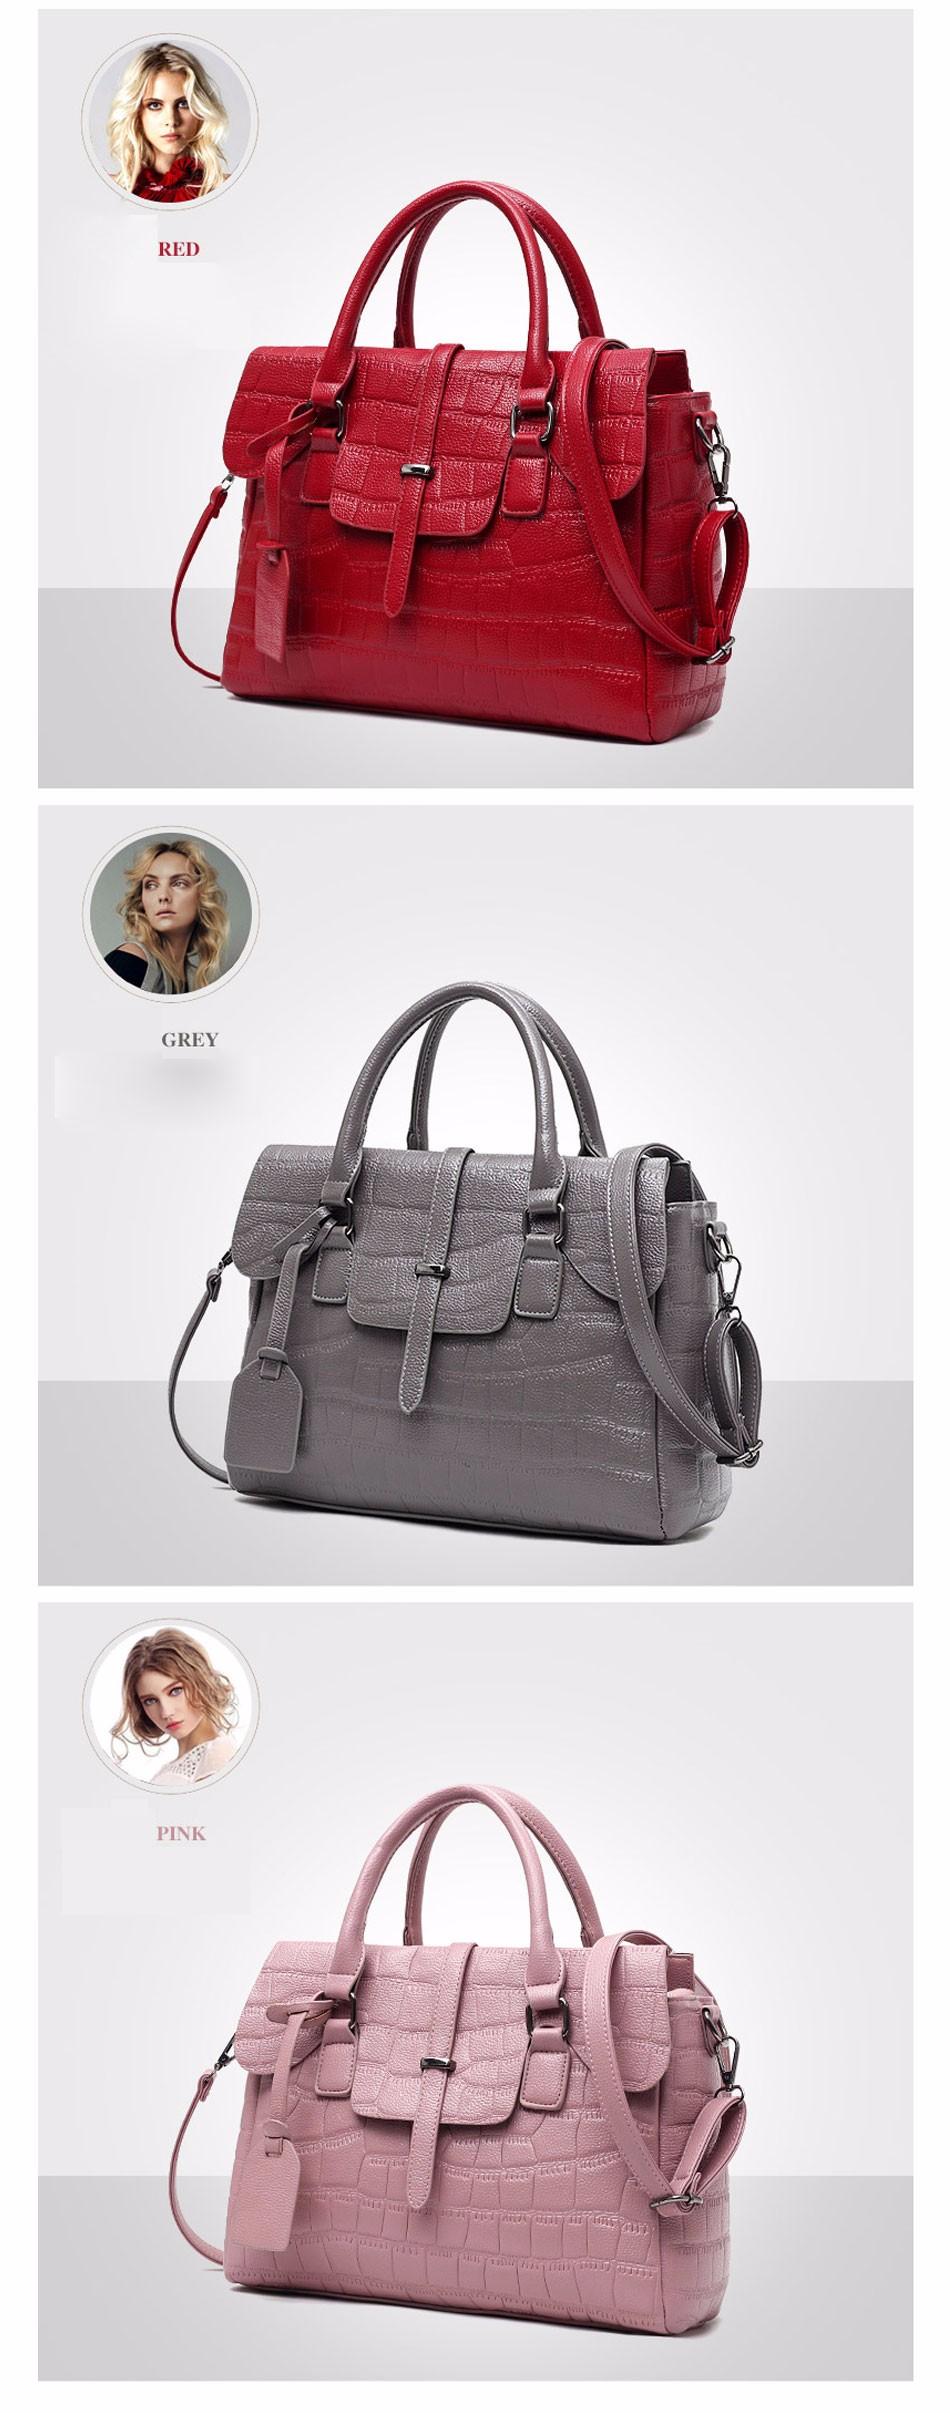 High Quality PU Leather Women's Handbags Shoulder Bag Ladies Hand Bags Stone Casual Women Bag Large Capacity Handbag 17 Sac 8